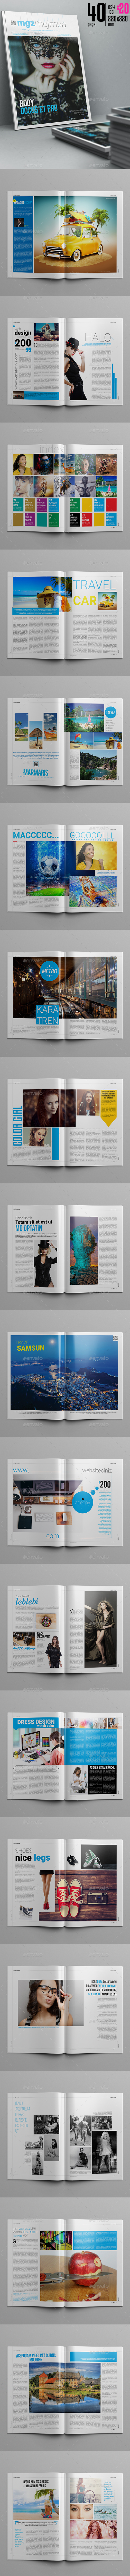 Mgzmejmua Magazine Template 40 Page - Magazines Print Templates